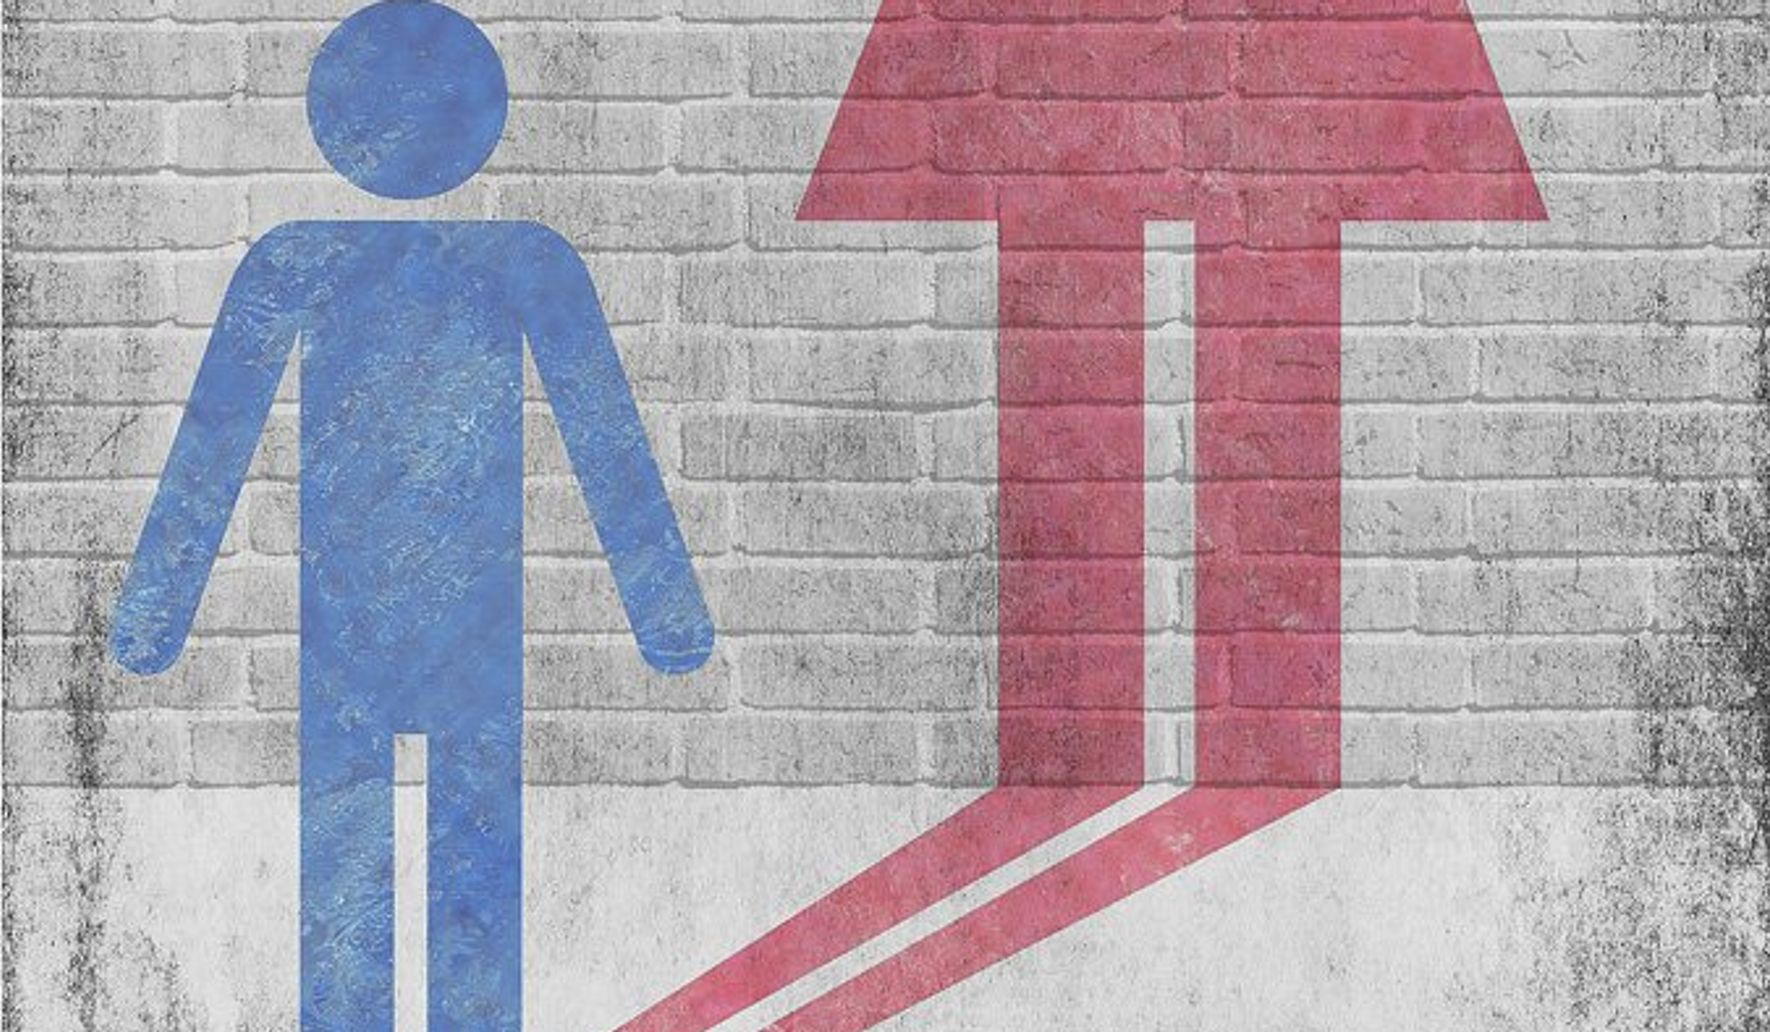 Opposing legal efforts to redefine 'sex' as 'gender identity'